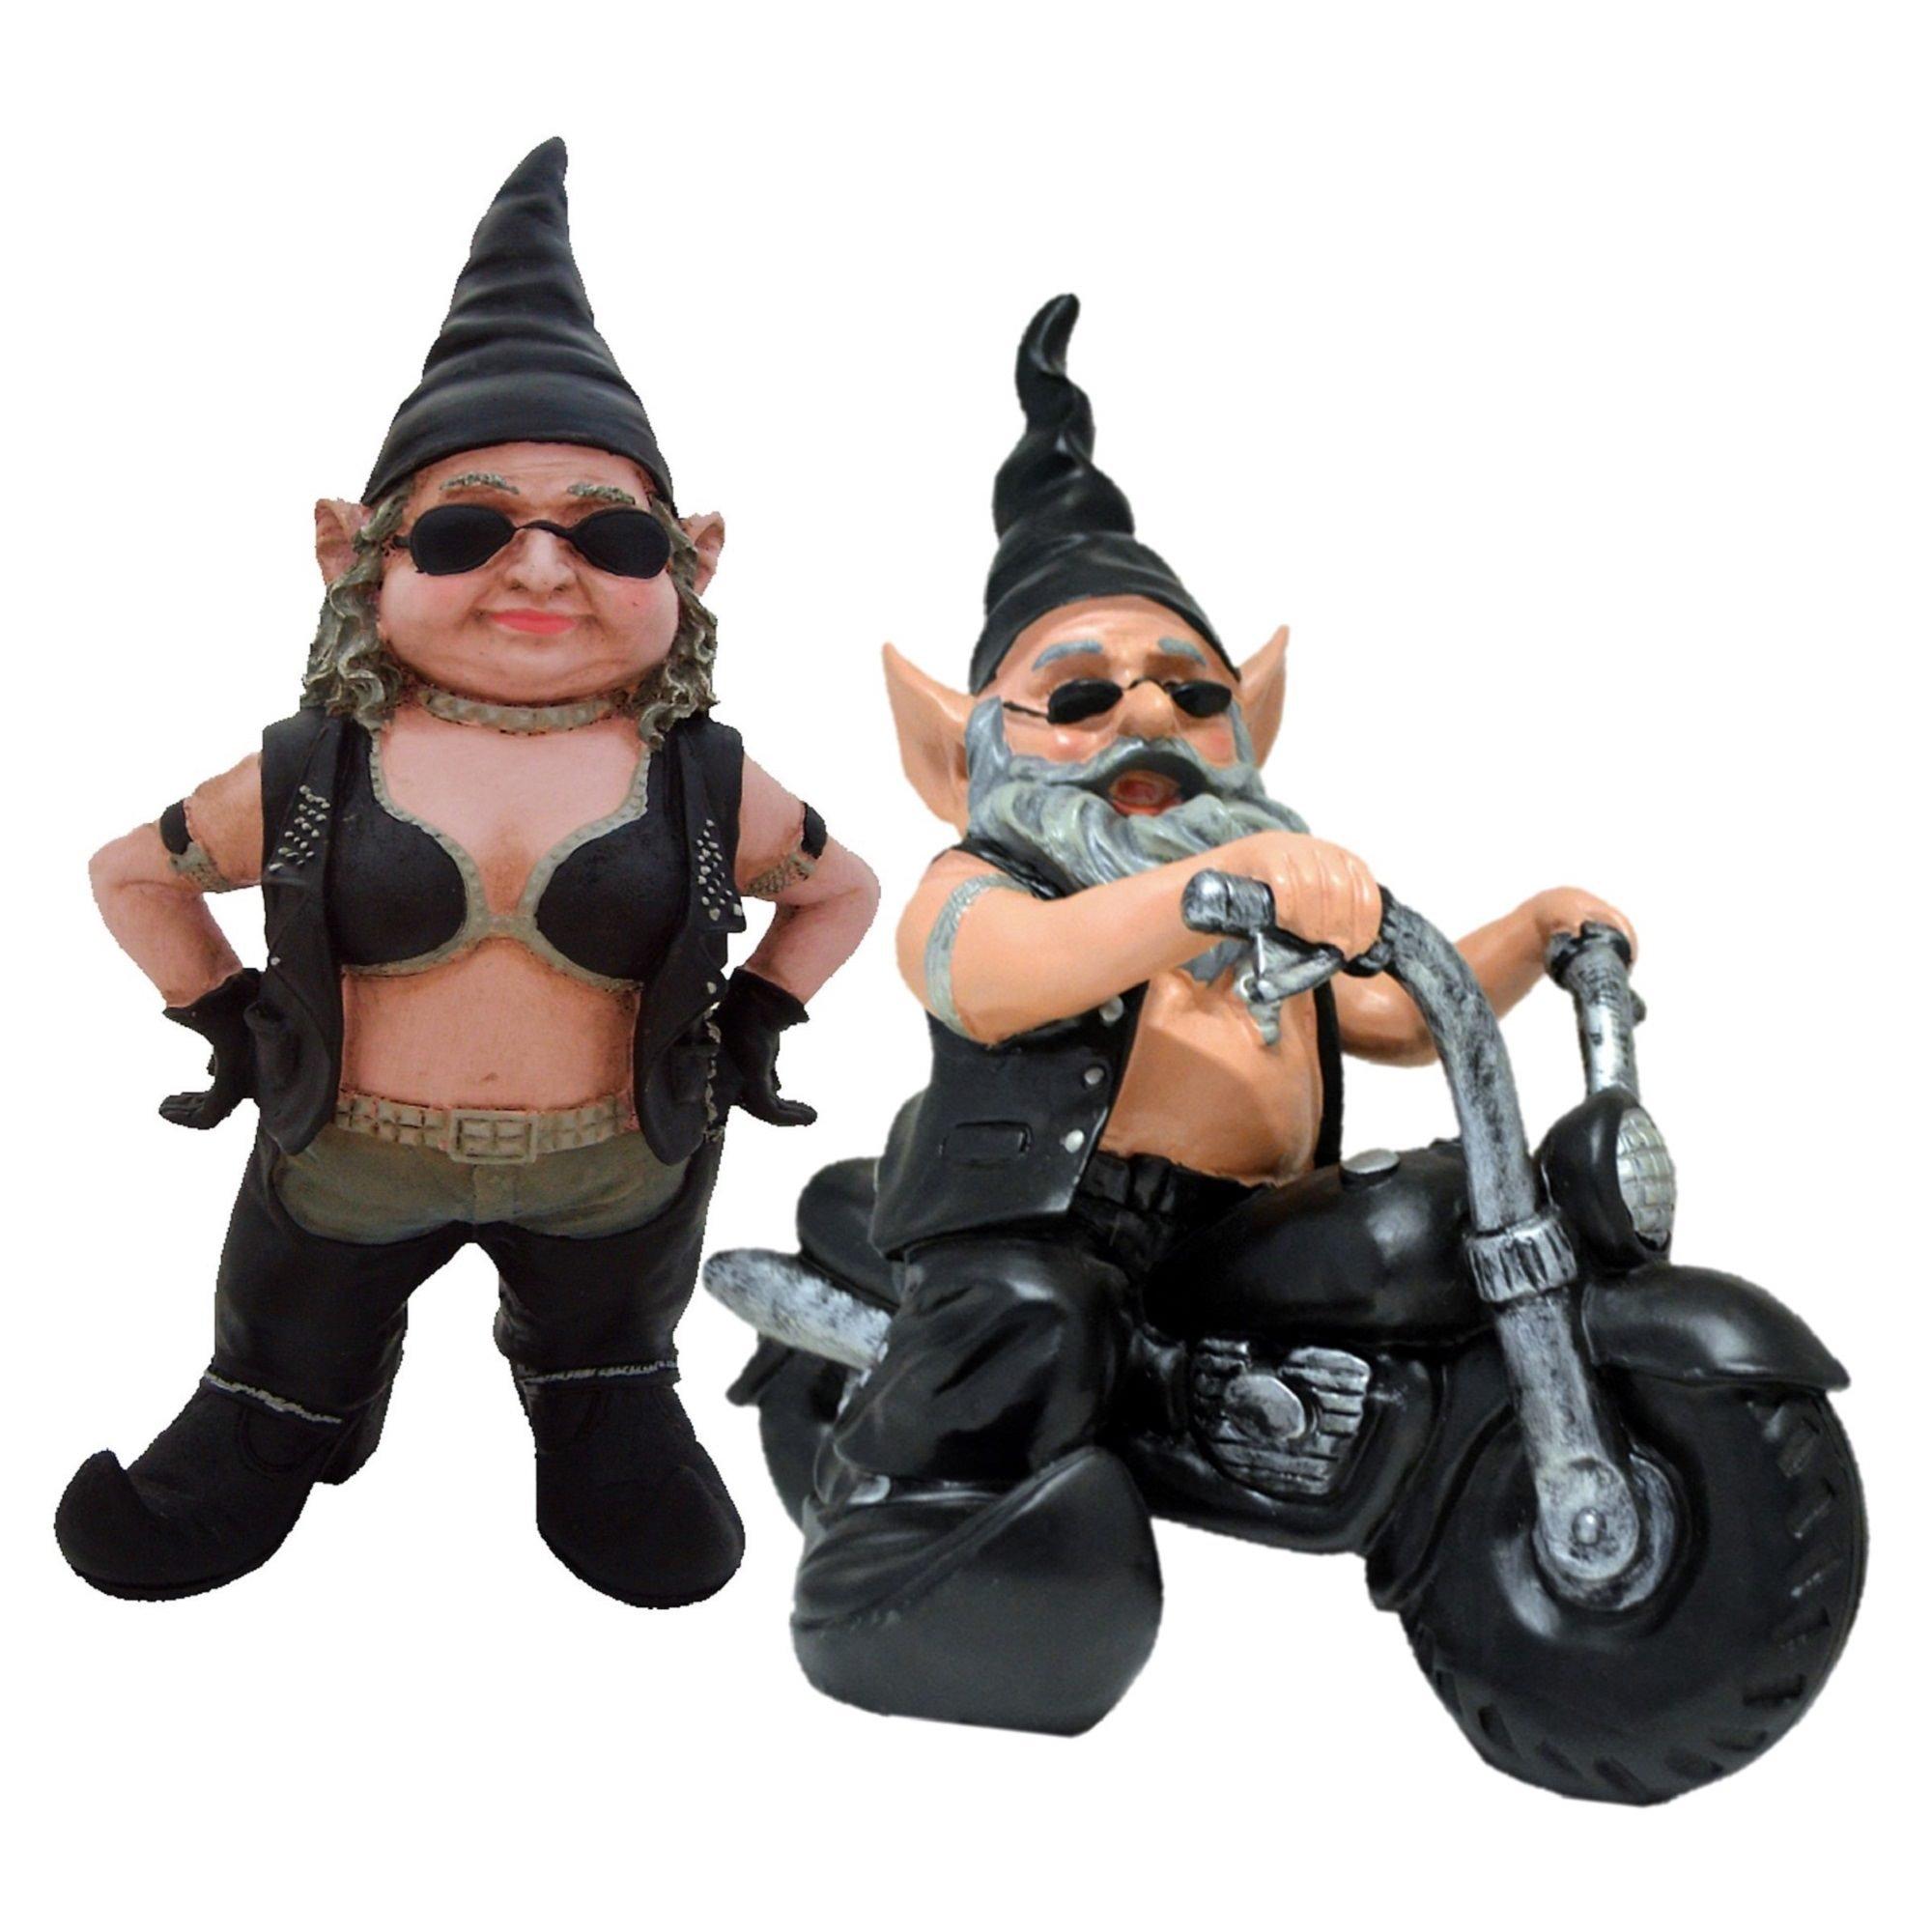 """Biker Babe"" & ""Biker Dude"" the Biker Gnome Riding His Black Bike in Leather Motorcycle Gear Home & Garden Gnome Statue"